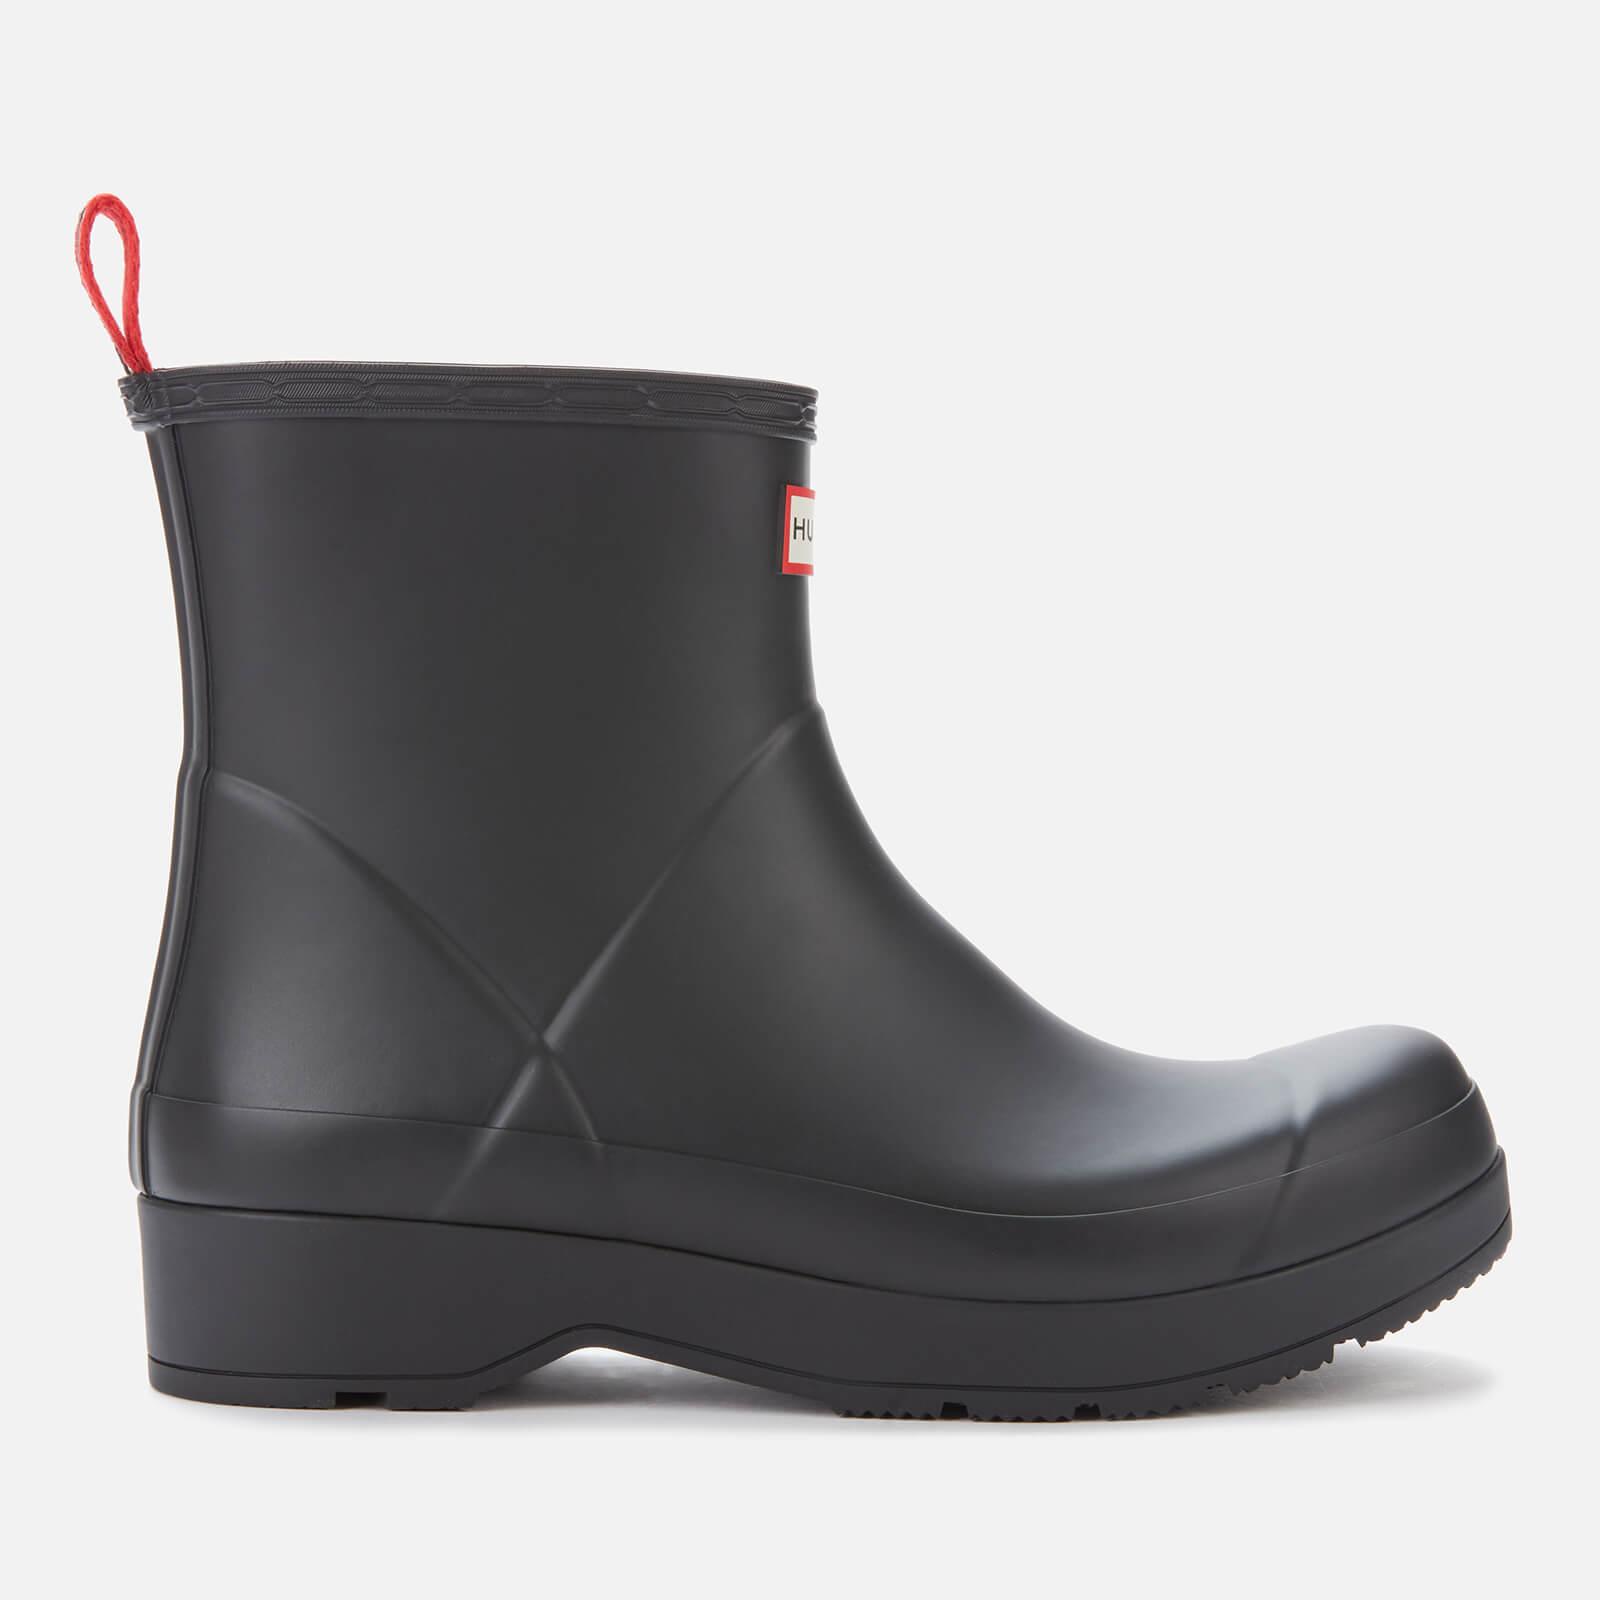 Hunter Men's Original Play Short Boots - Black - UK 11